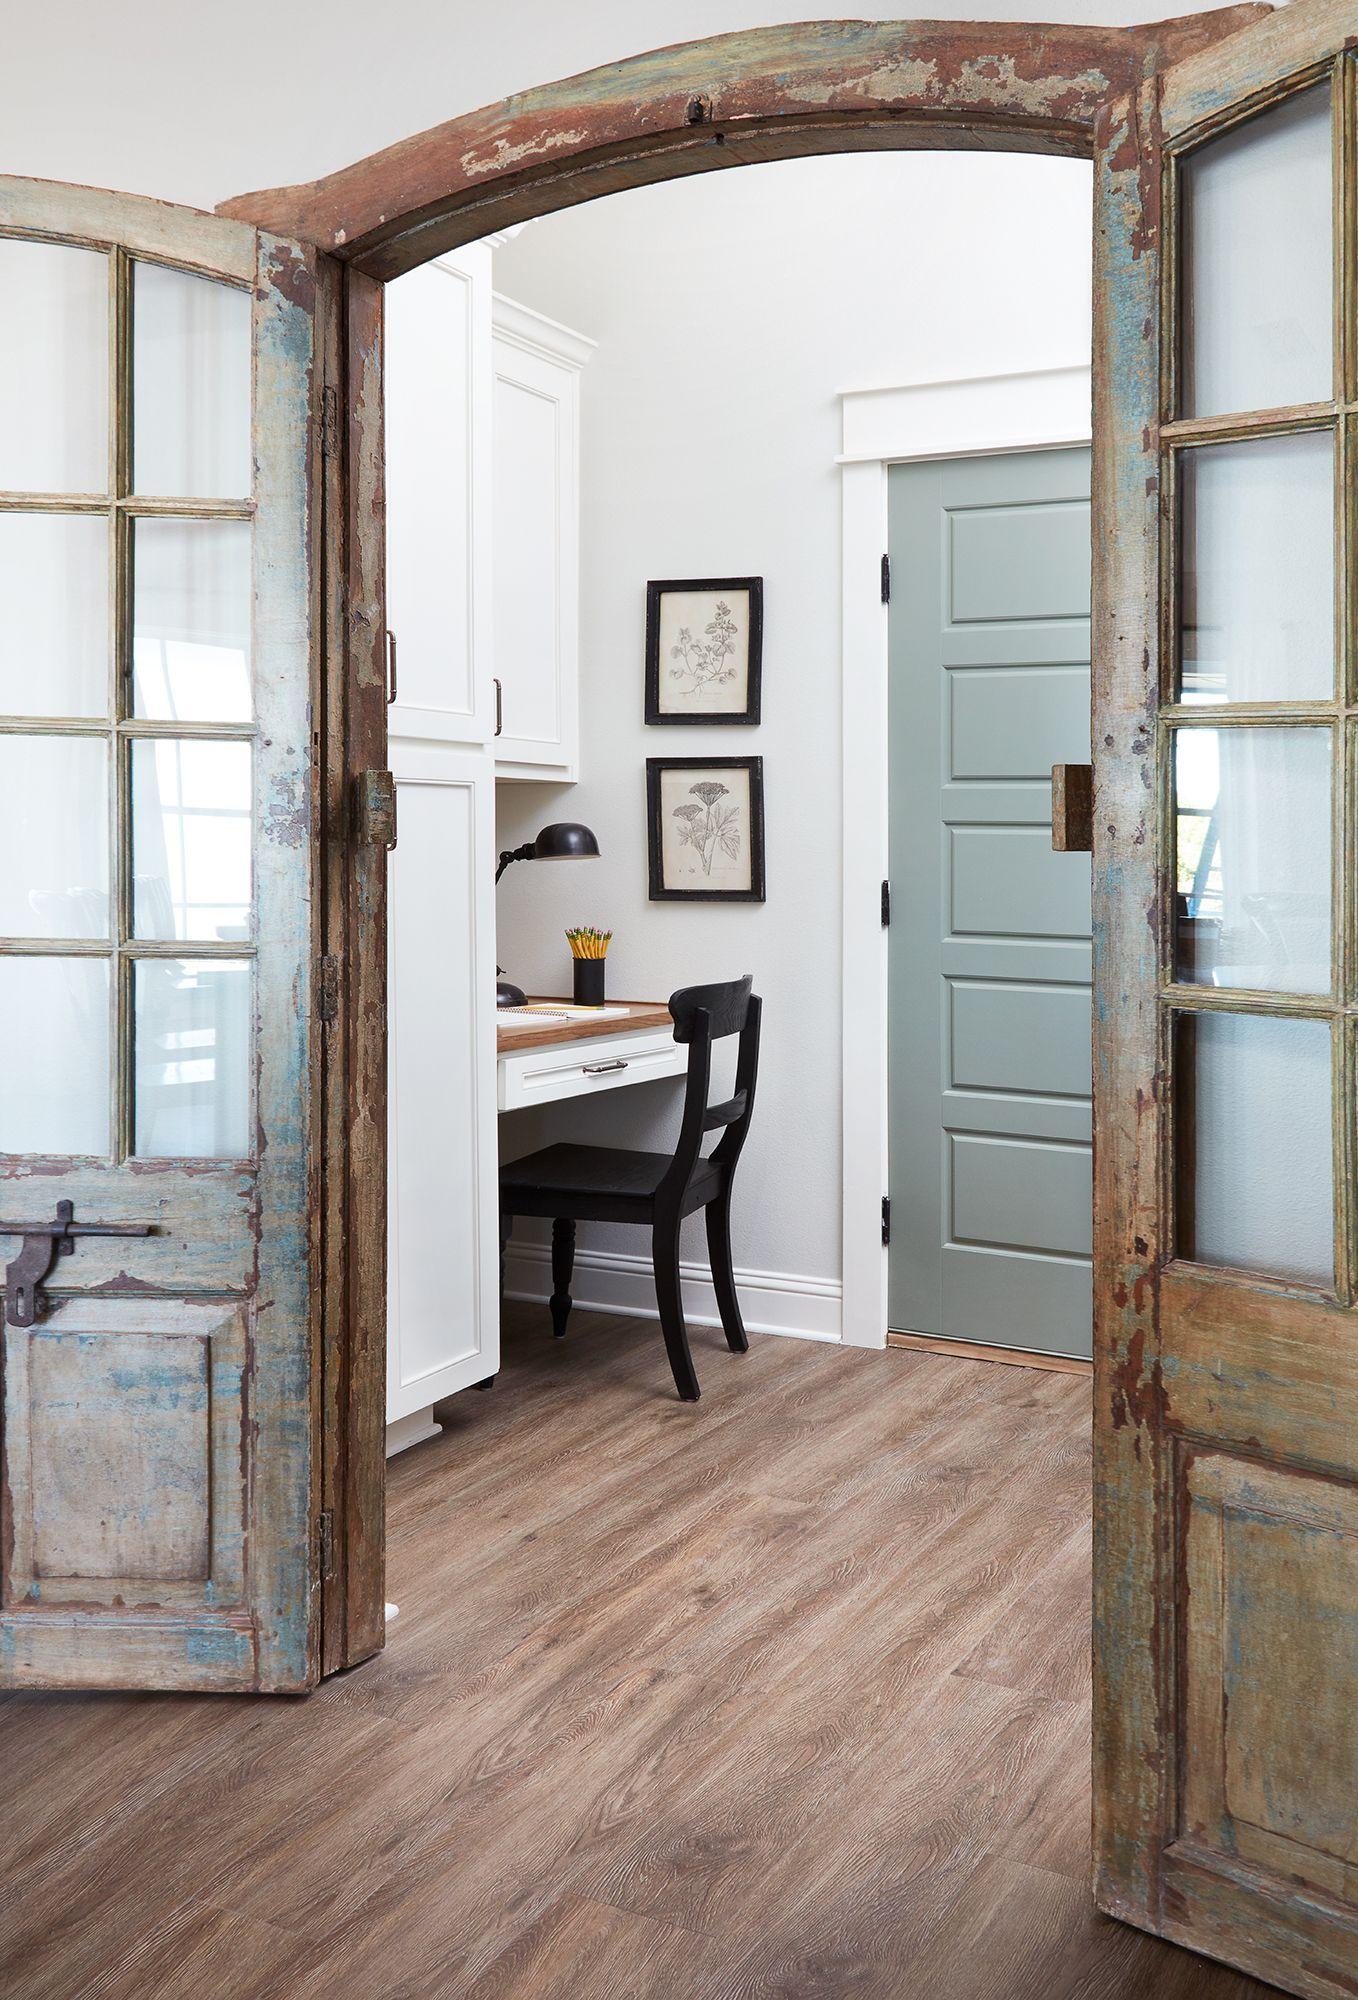 Episode 13 Season 5 Antique French Doors Rustic Home Interiors French Doors Interior